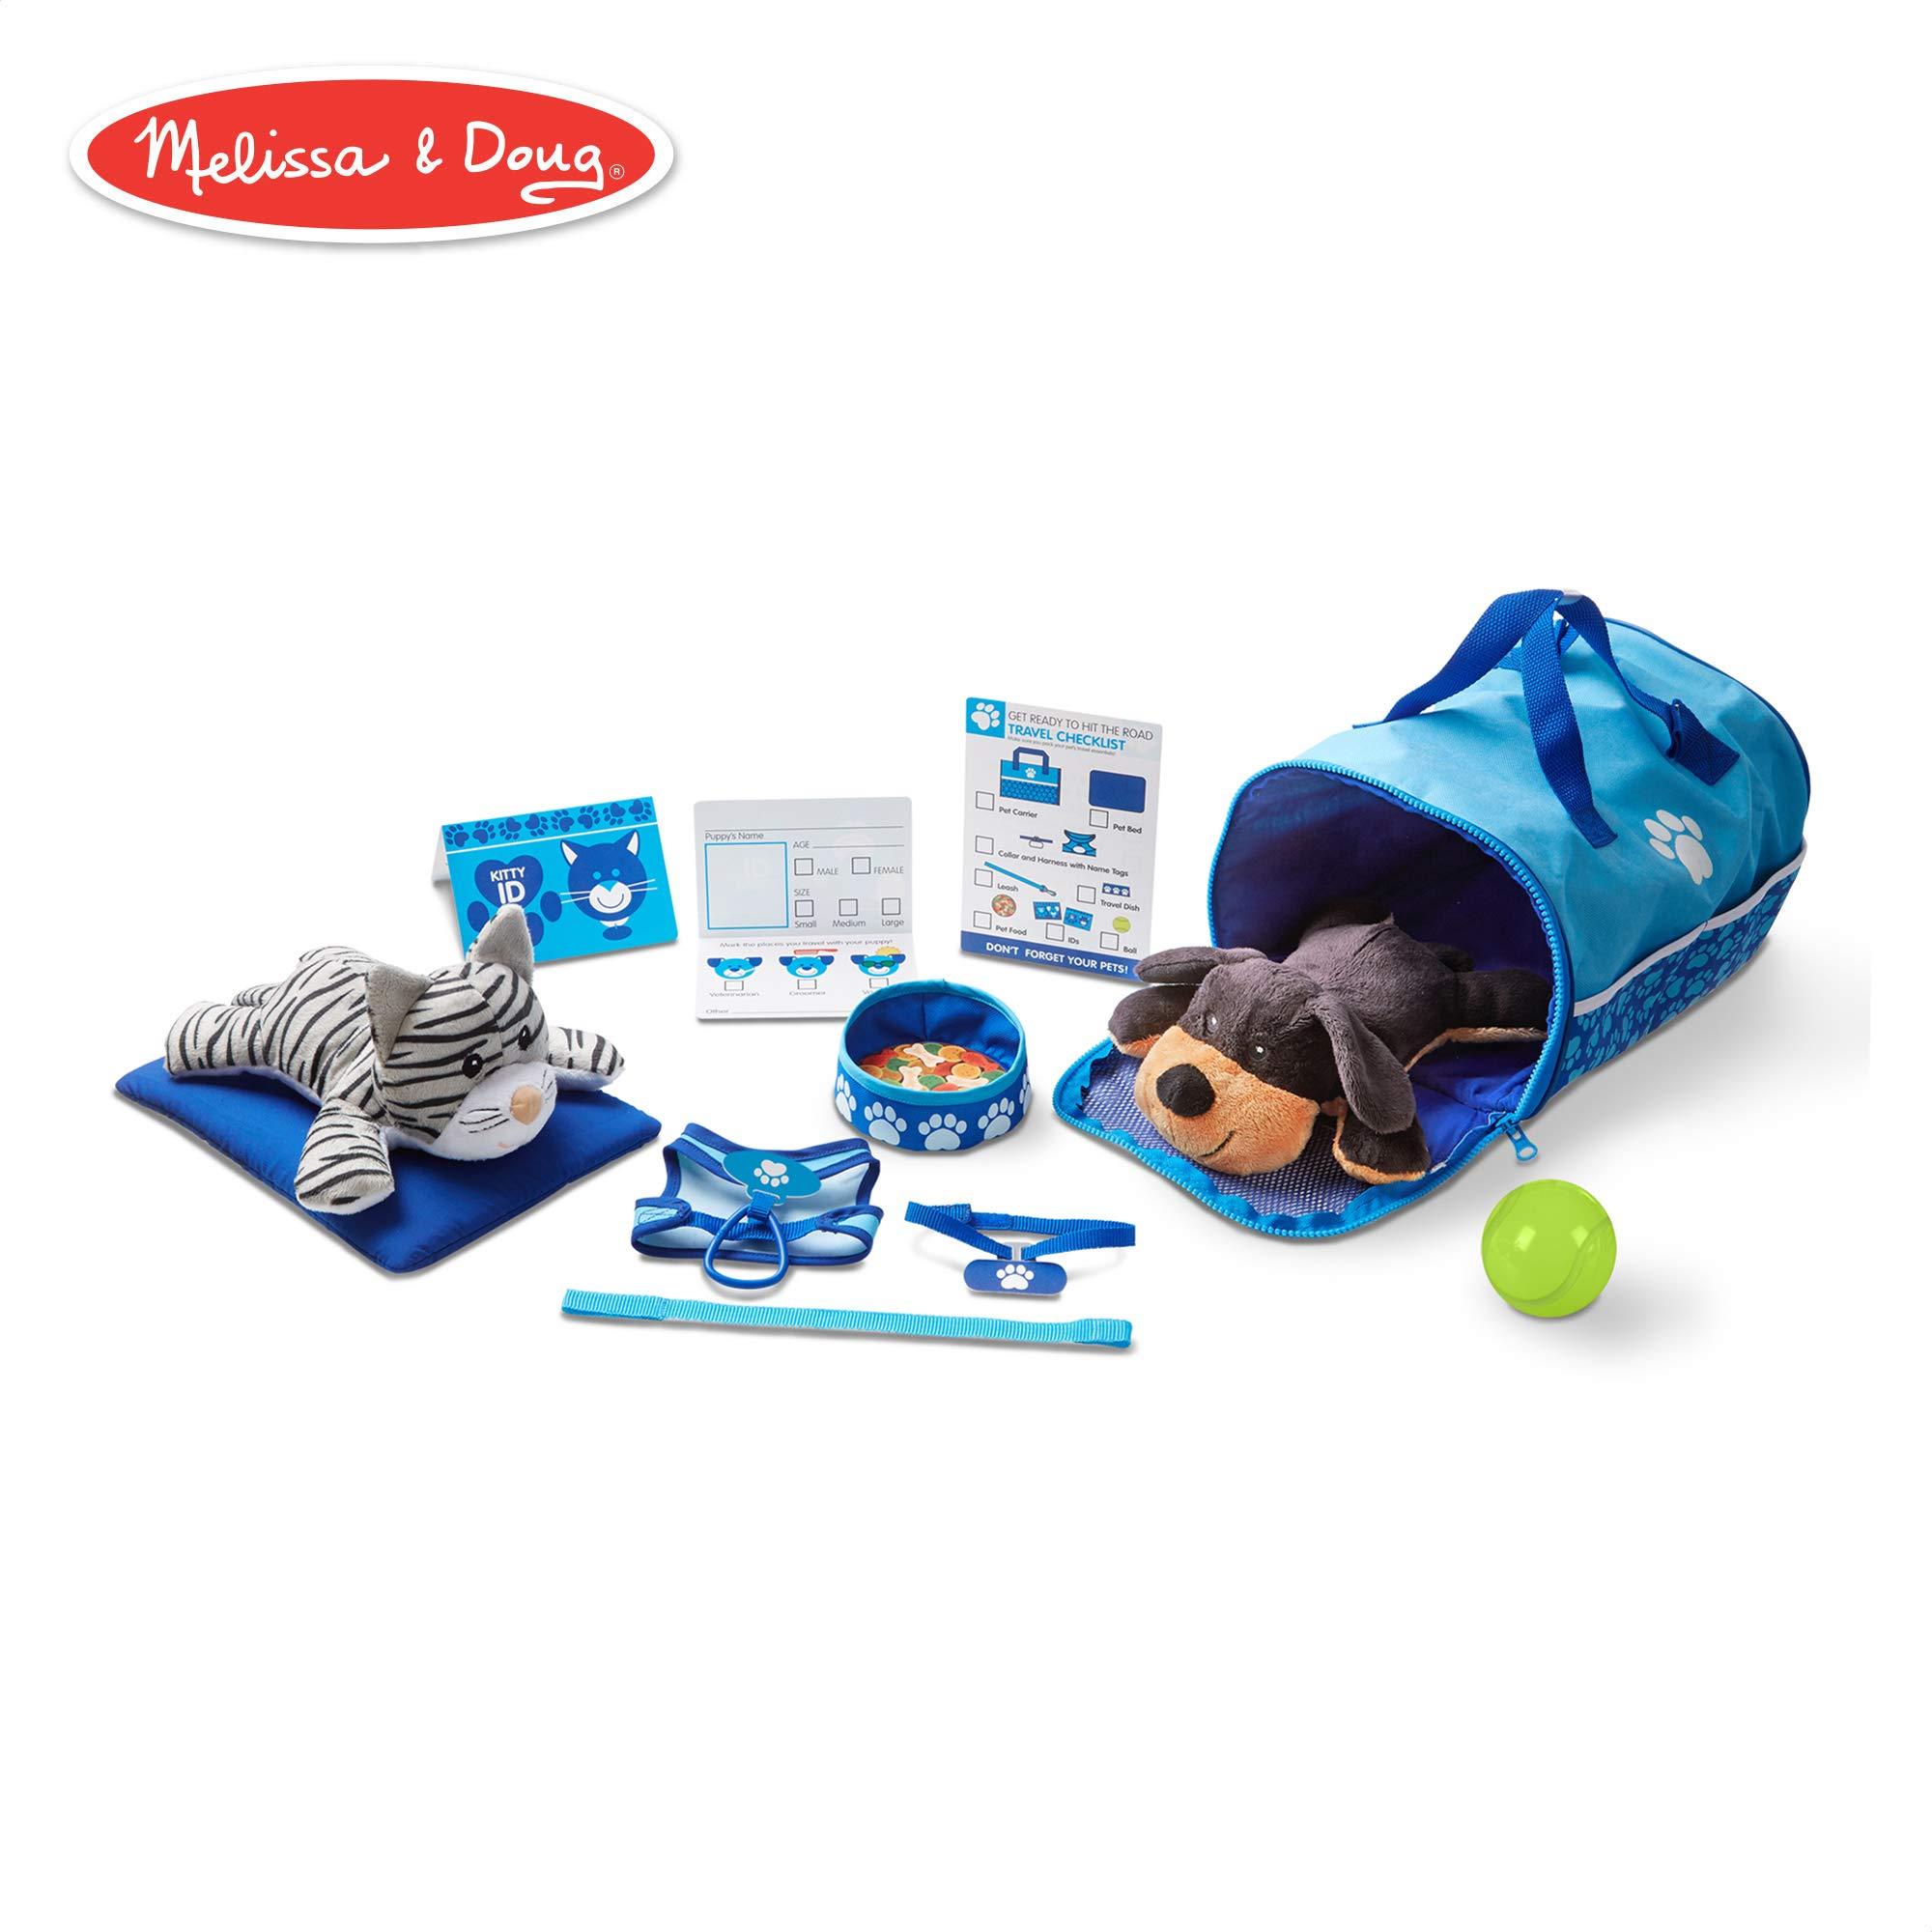 Melissa & Doug Tote & Tour Pet Travel Play Set (2 Plush Stuffed Animals, 15 Pieces, 10.5'' H x 3.5'' W x 13.5'' L) by Melissa & Doug